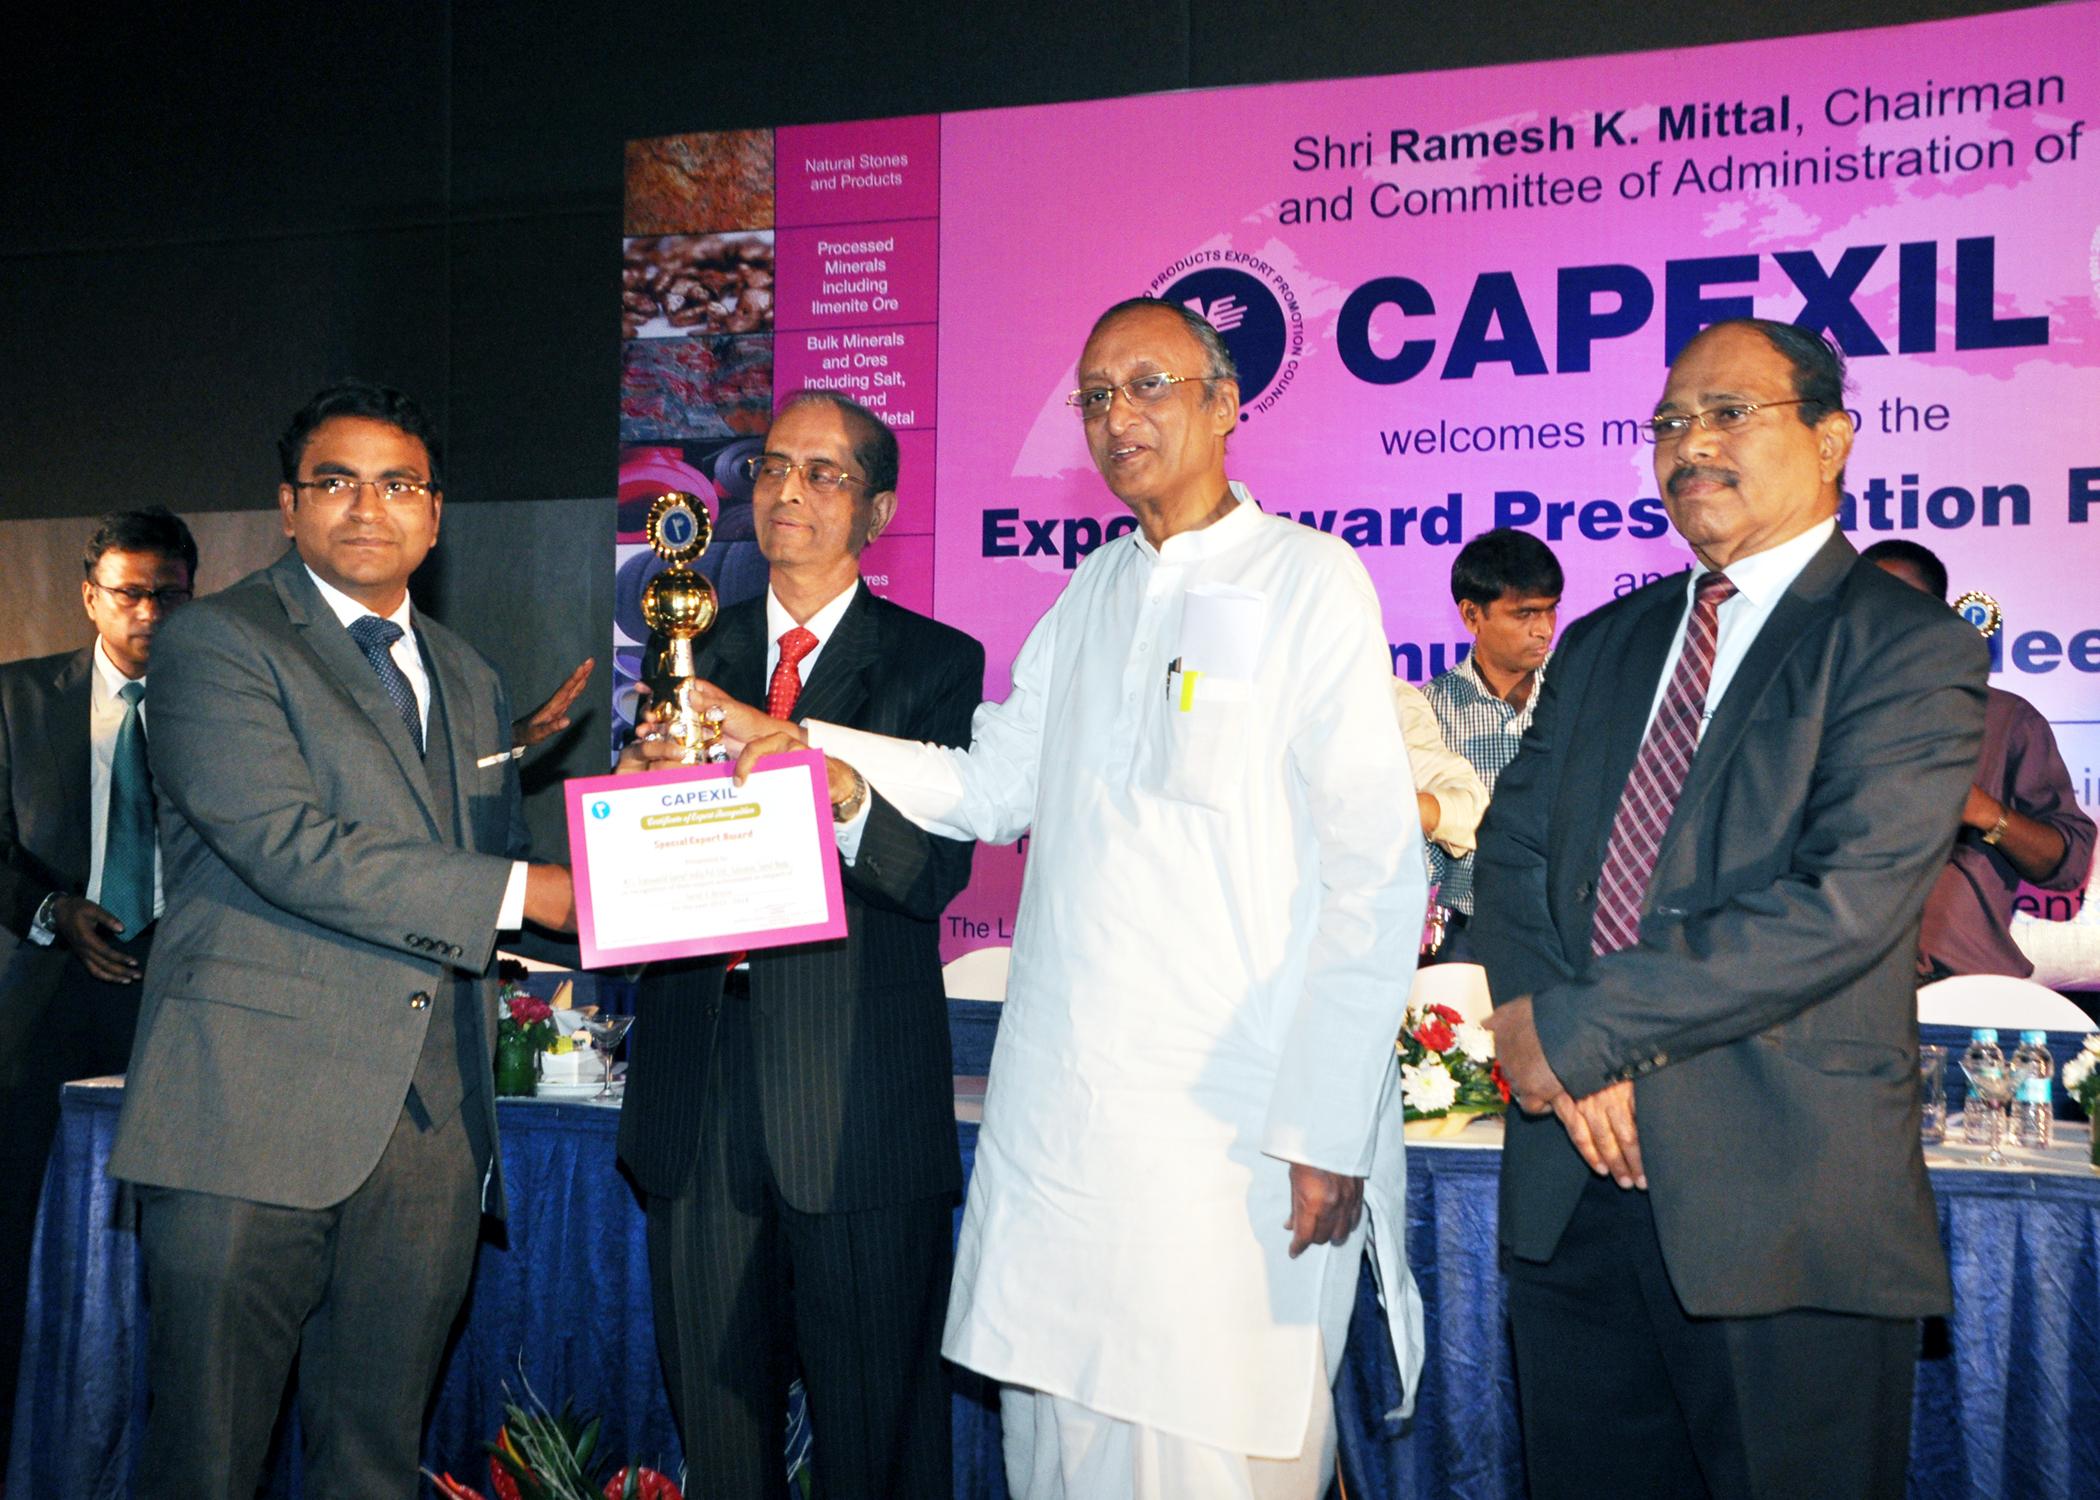 tgi-capexil-award-received-by-subbu-2013-14